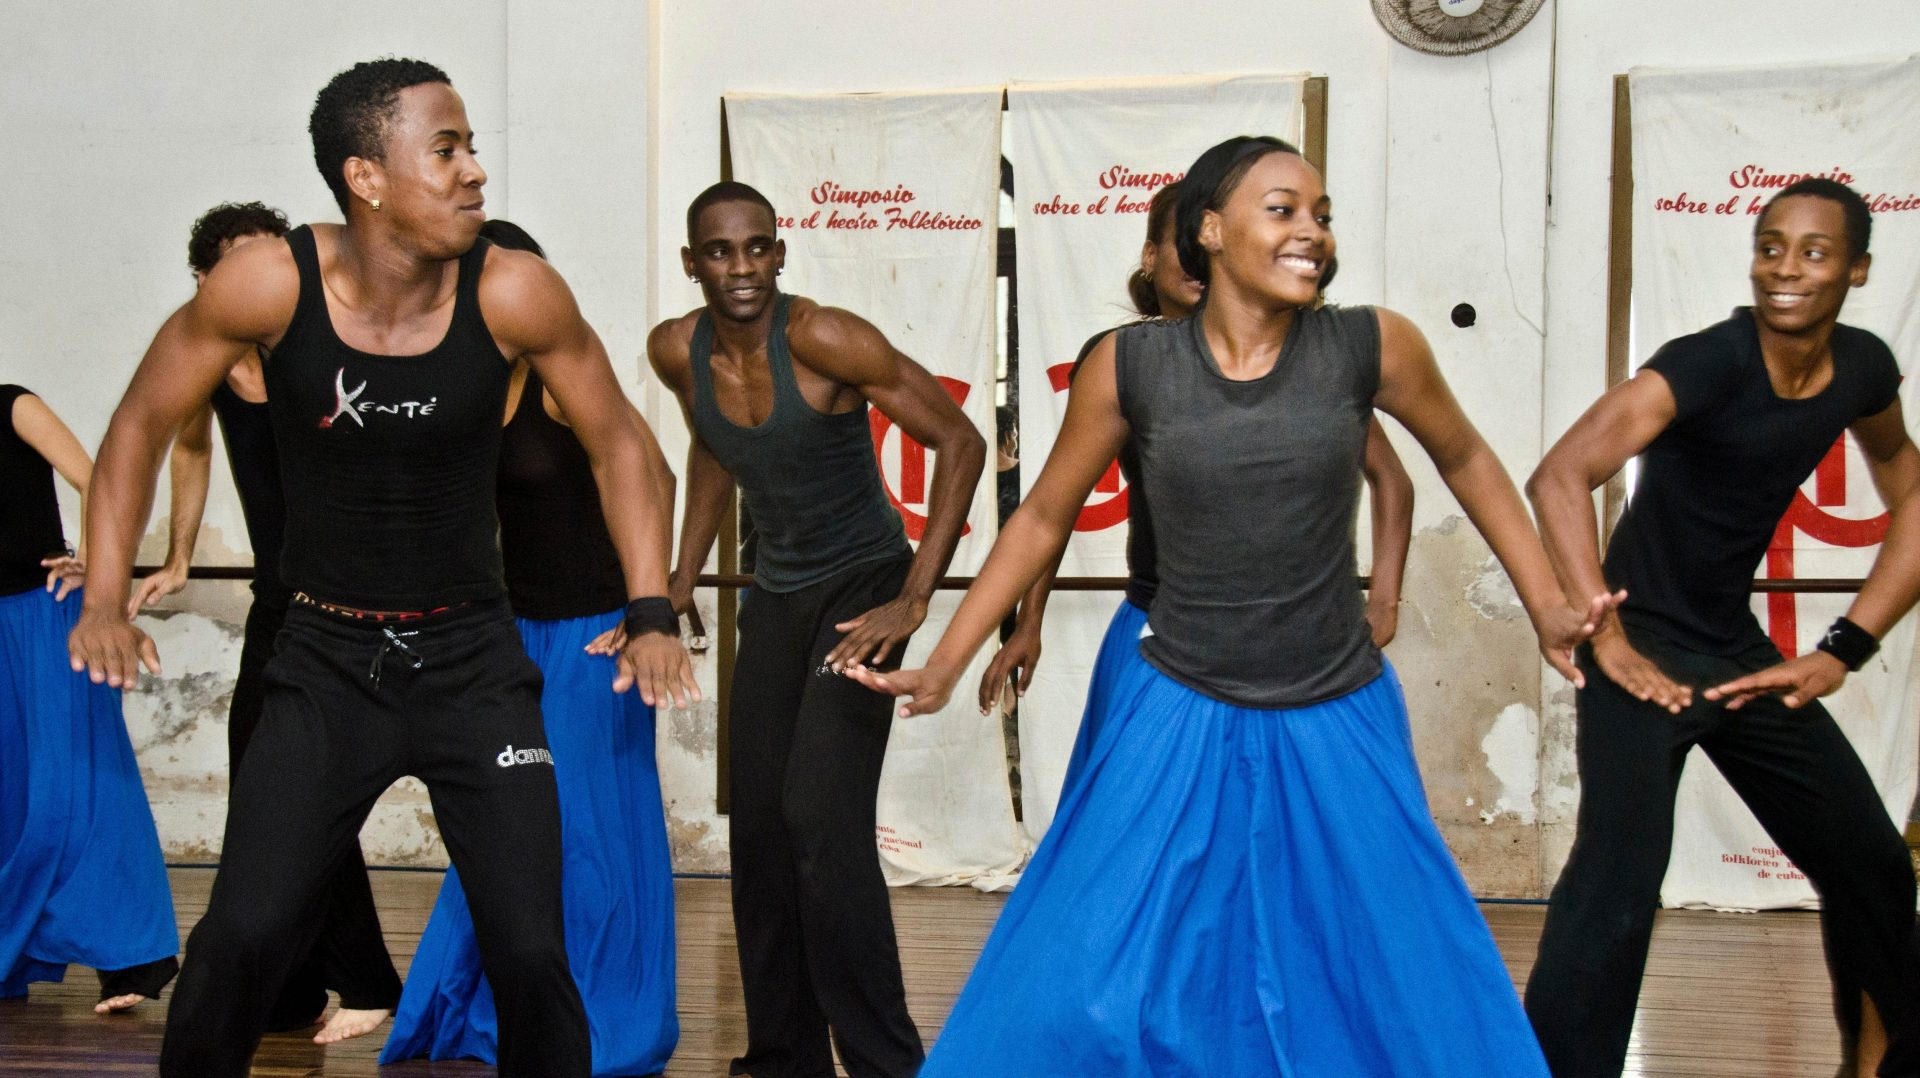 Cuban Ballet Folklorica practicing in Havana, Cuba